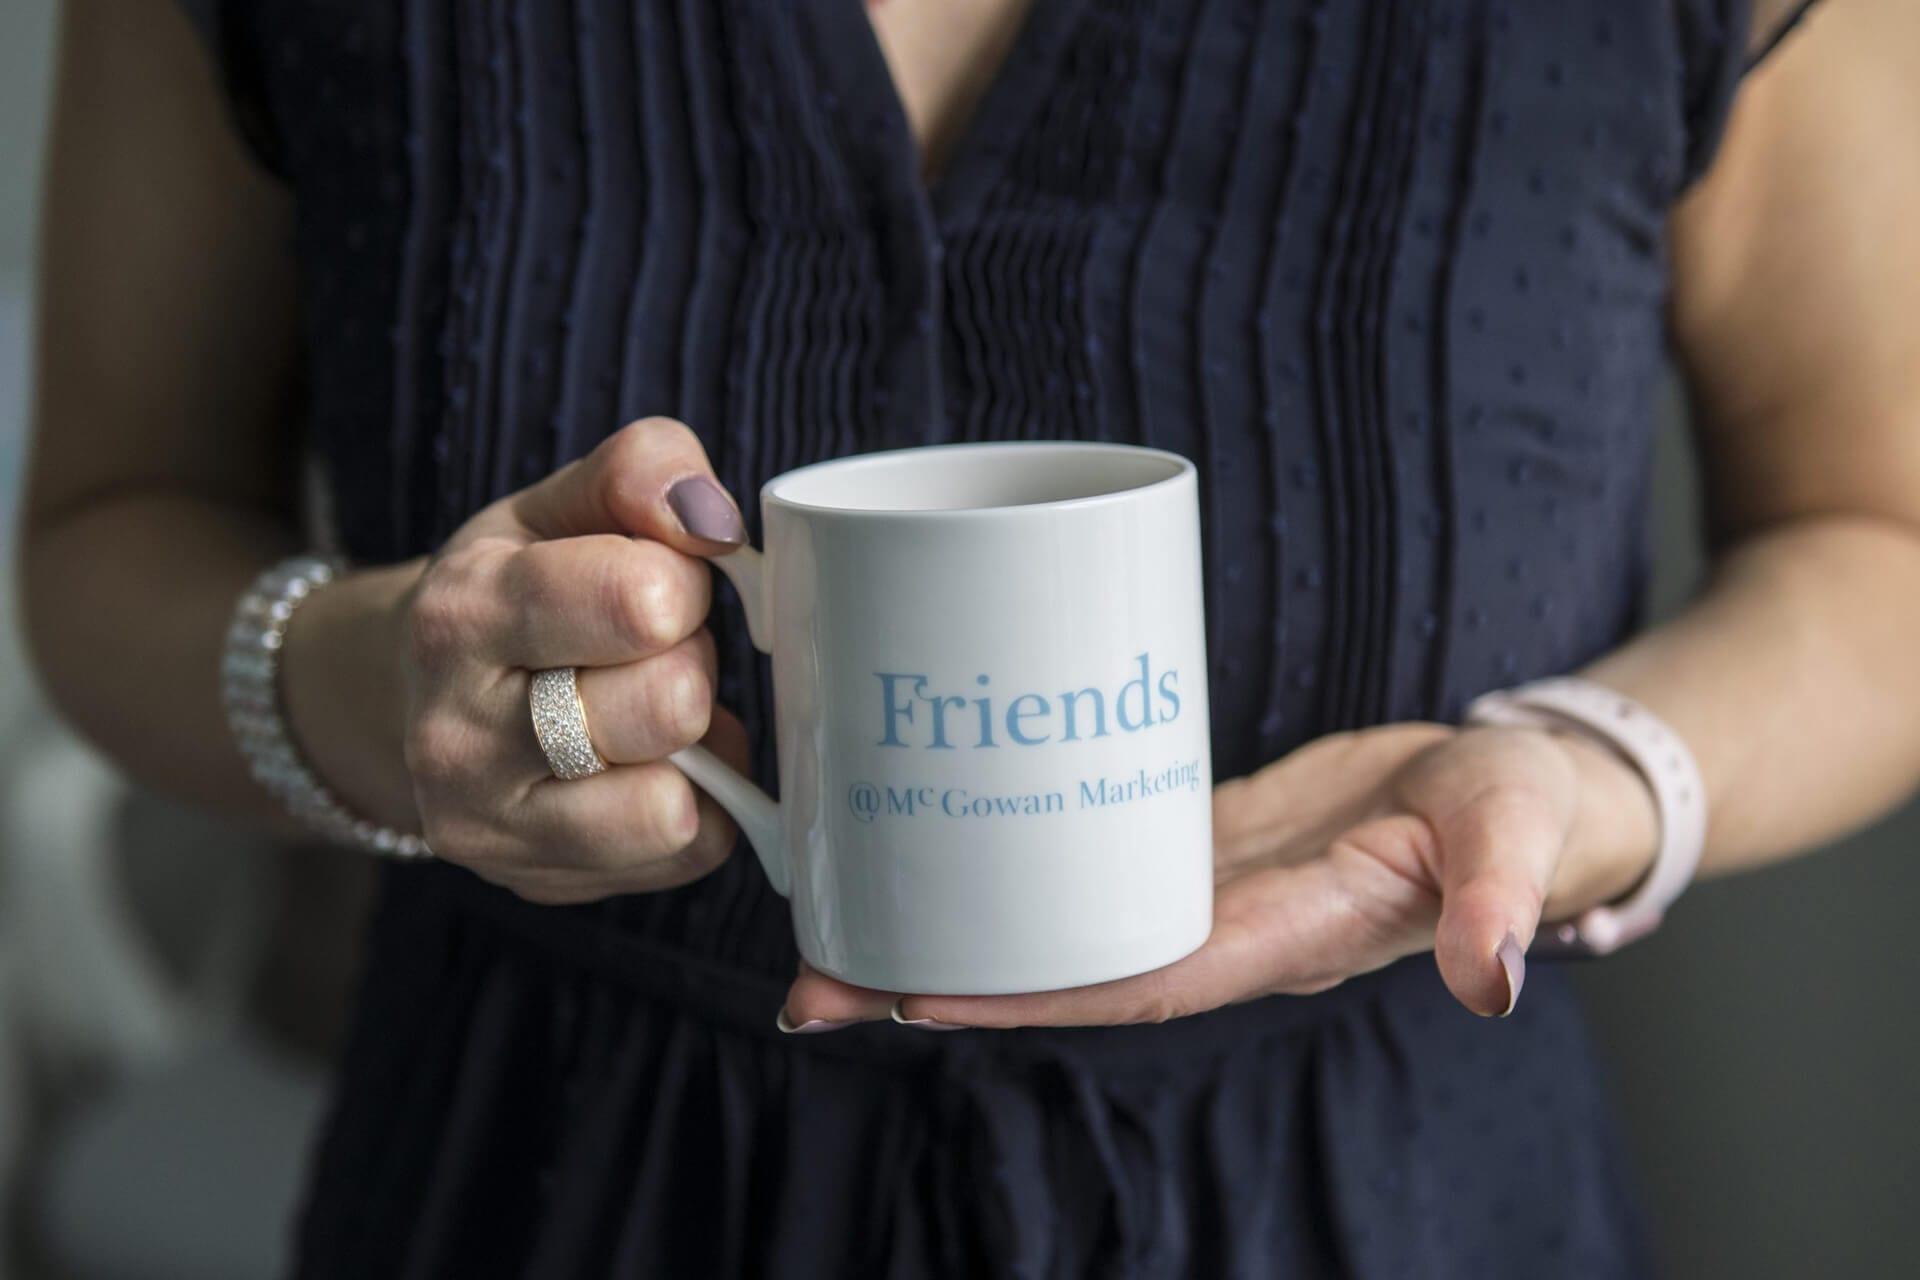 Emily McGowan of McGowan Marketing holding a mug.